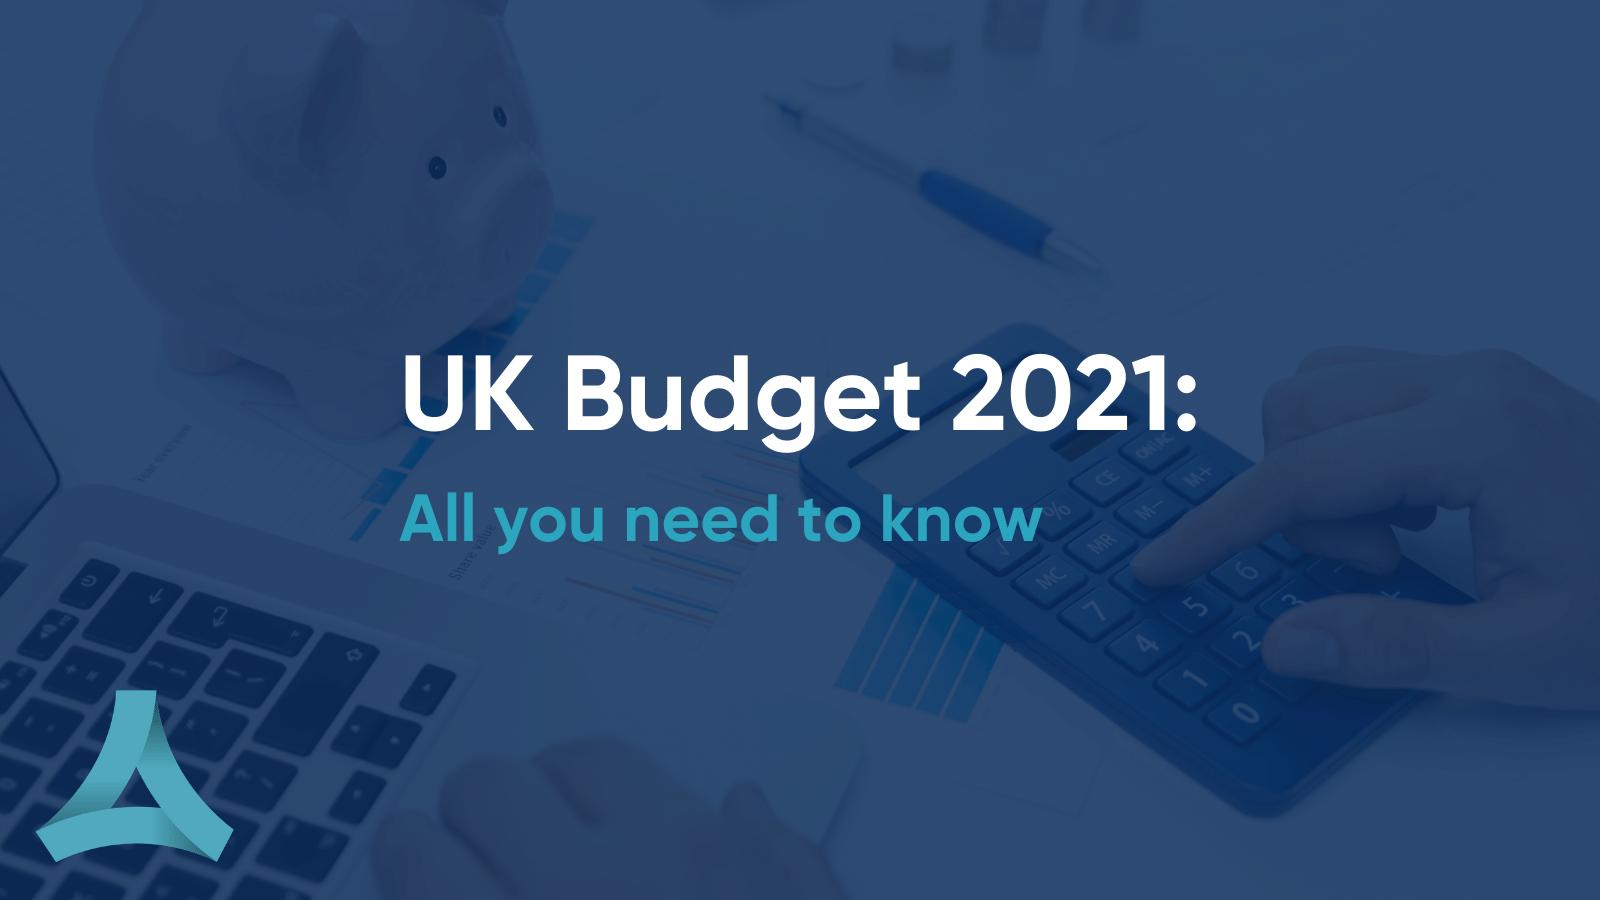 UK Budget 2021 update